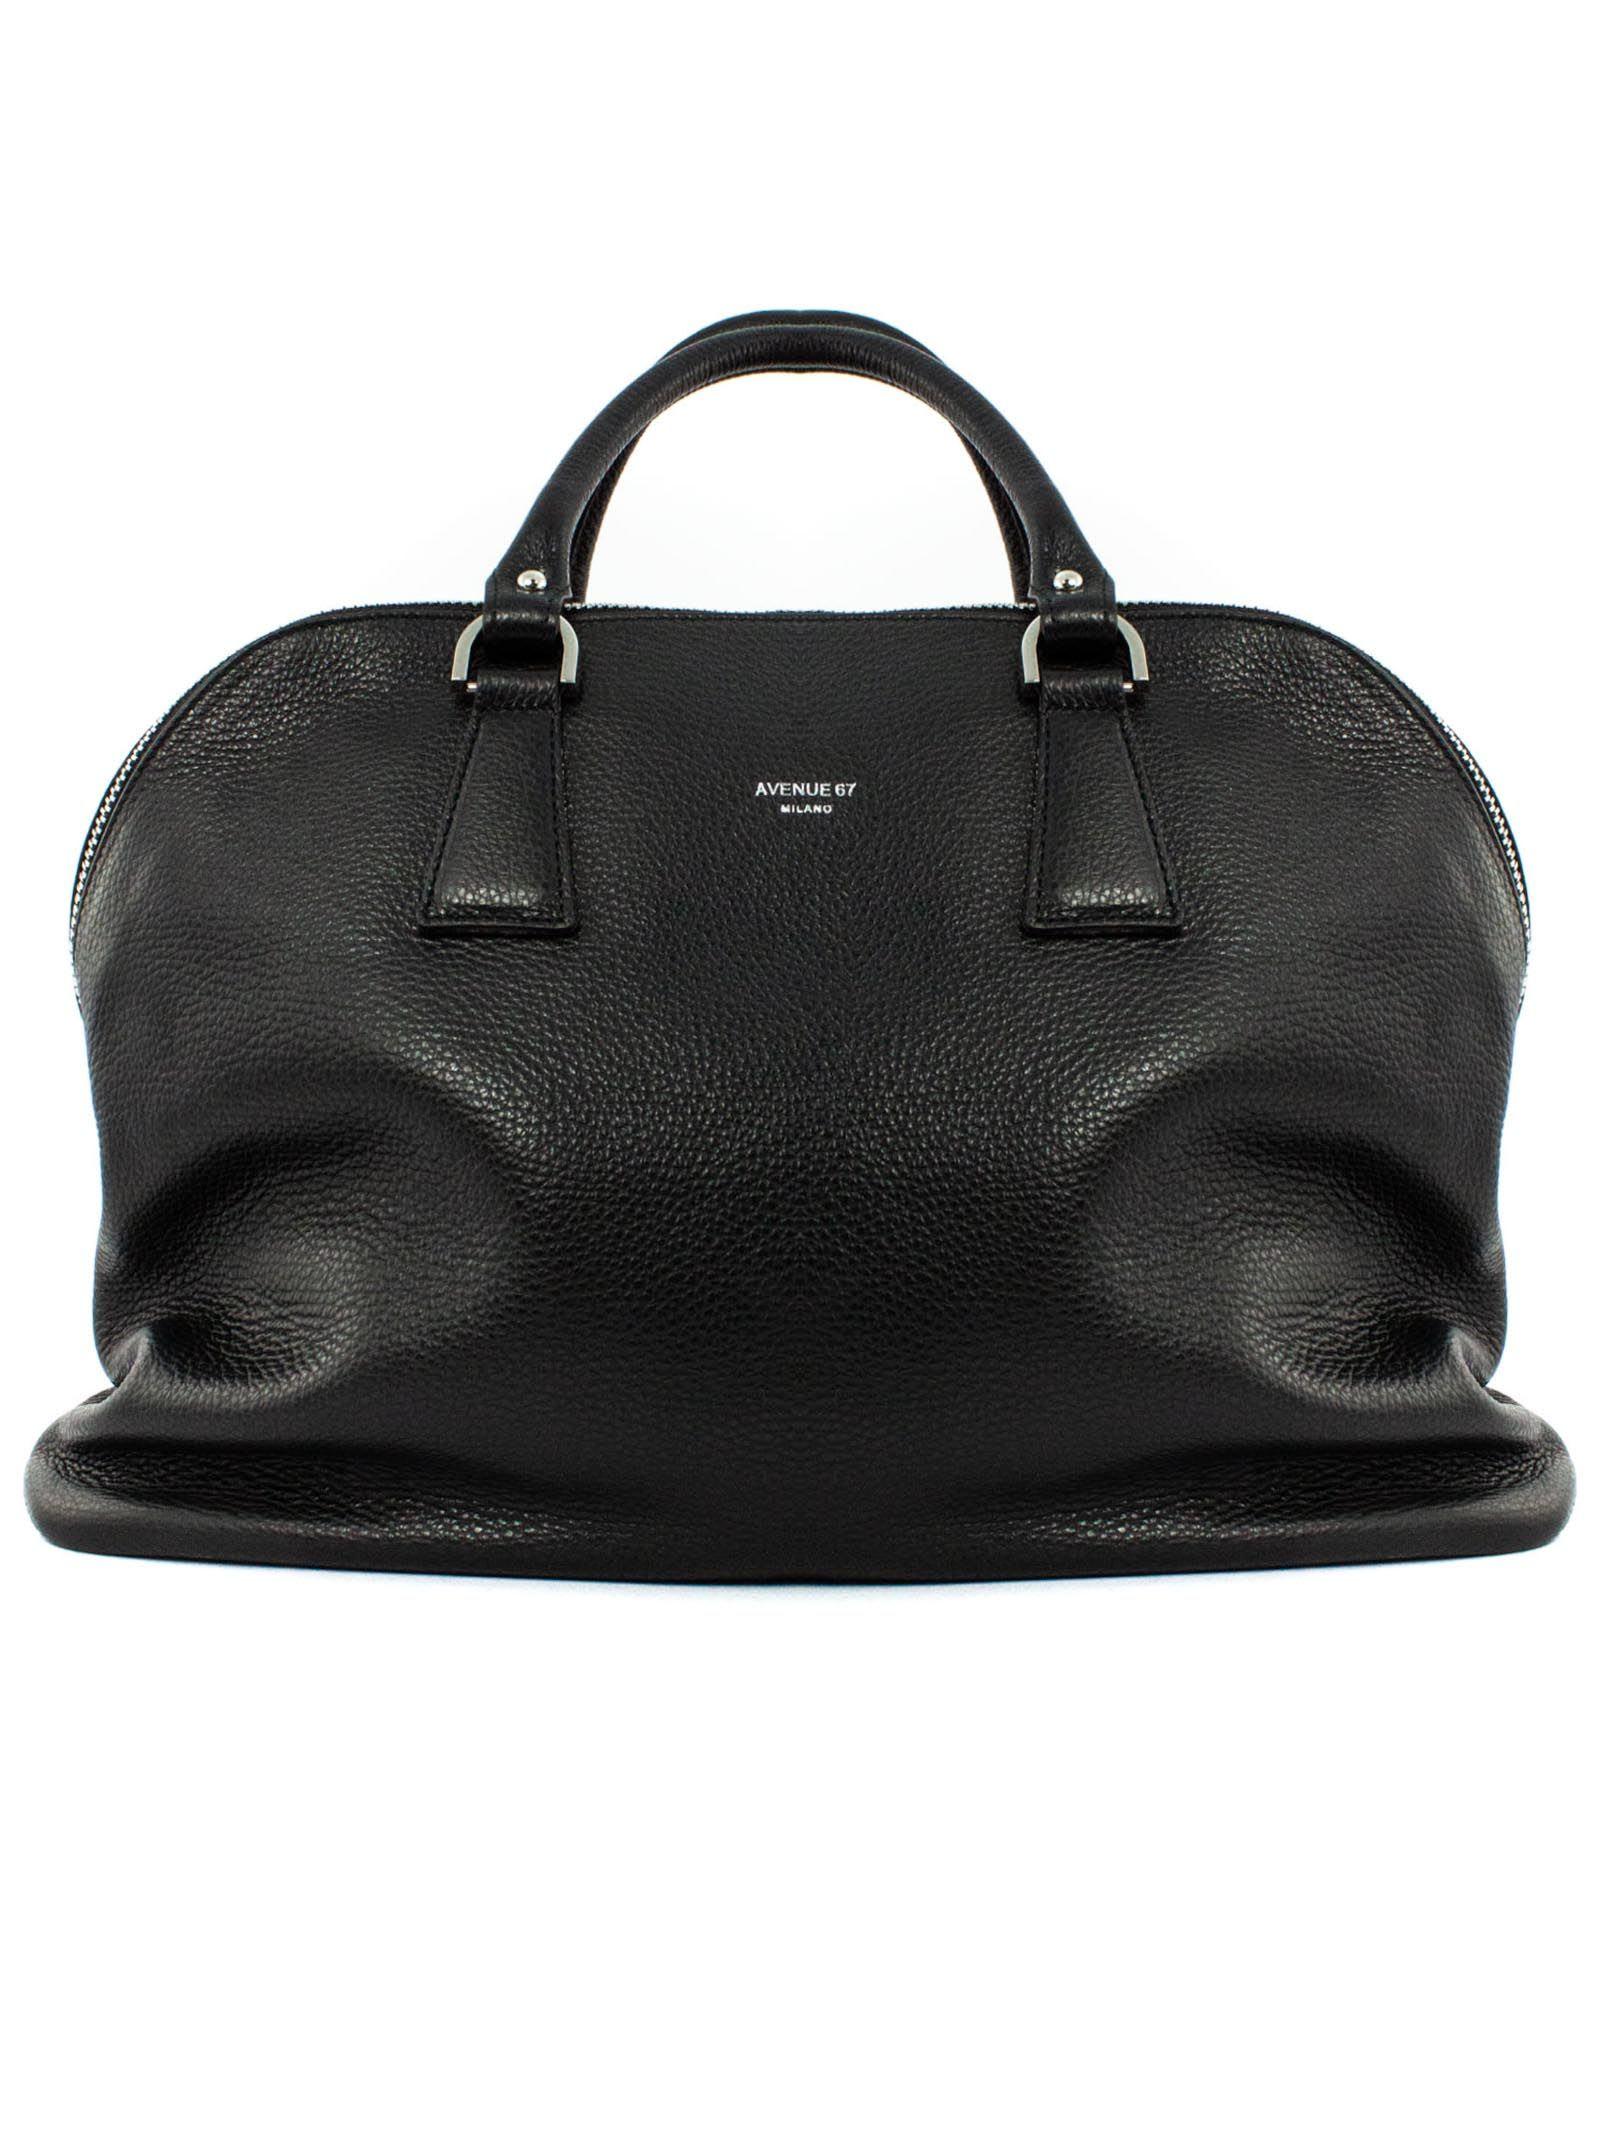 Fandango Bag In Black Soft Leather